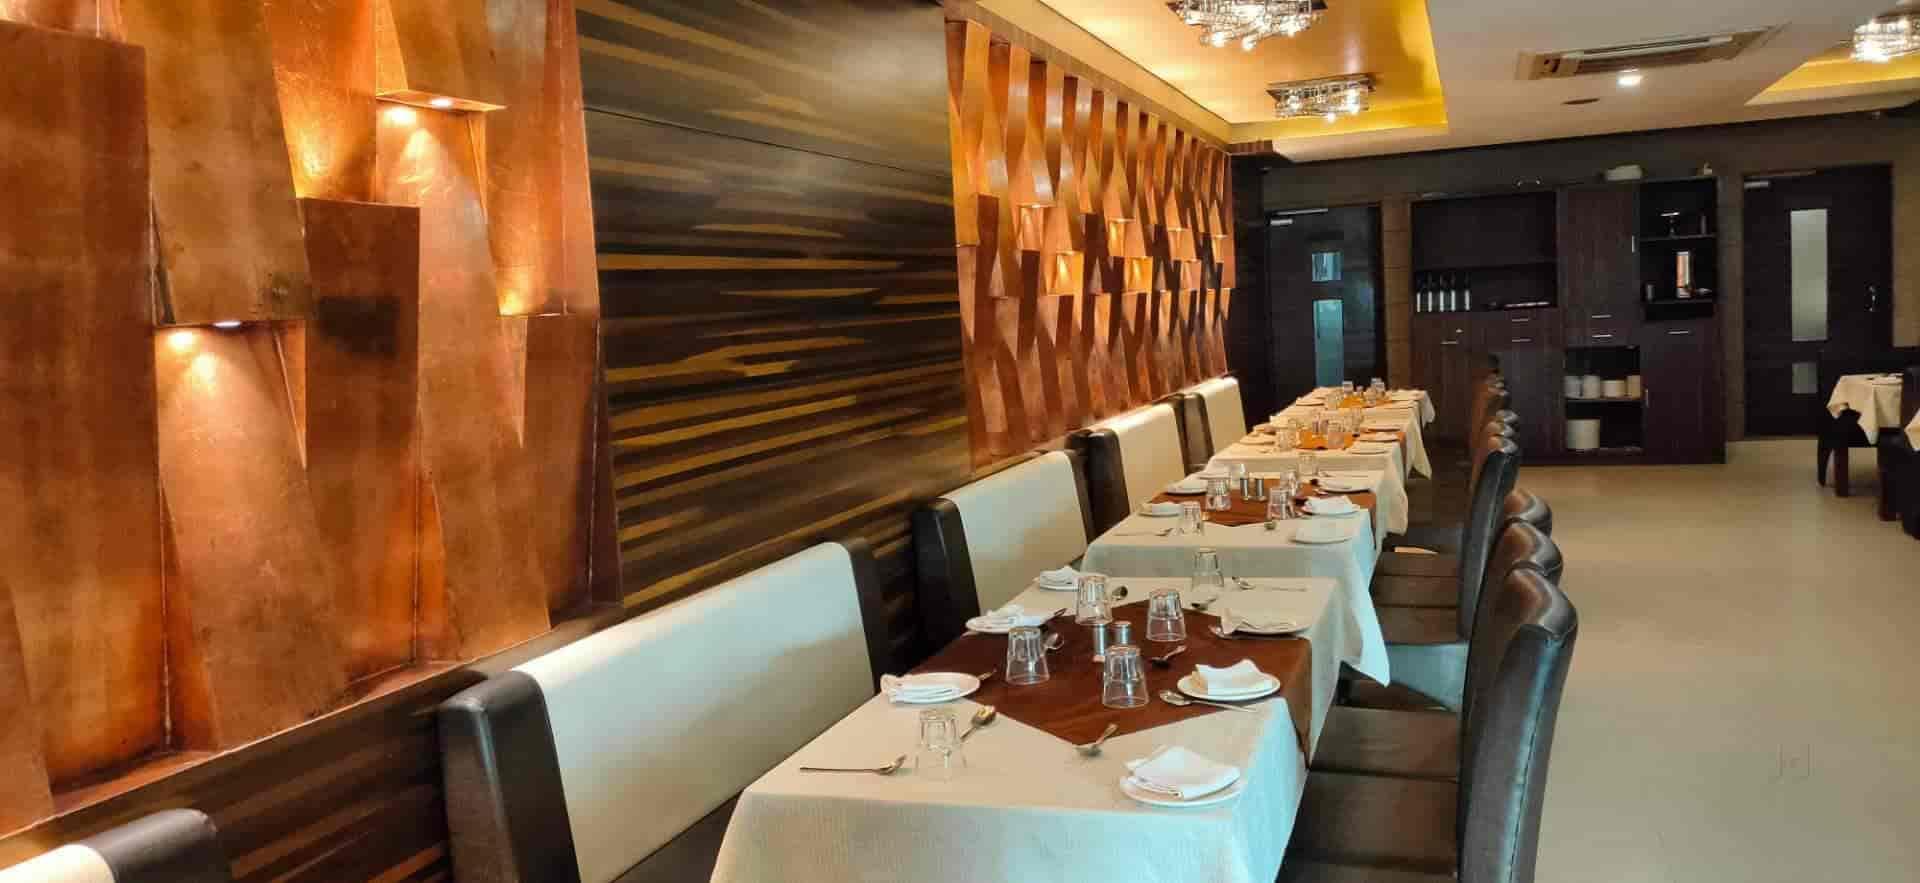 Alinea Restaurant And Banquet Ellis Bridge Ahmedabad Chinese North Indian Cuisine Restaurant Justdial